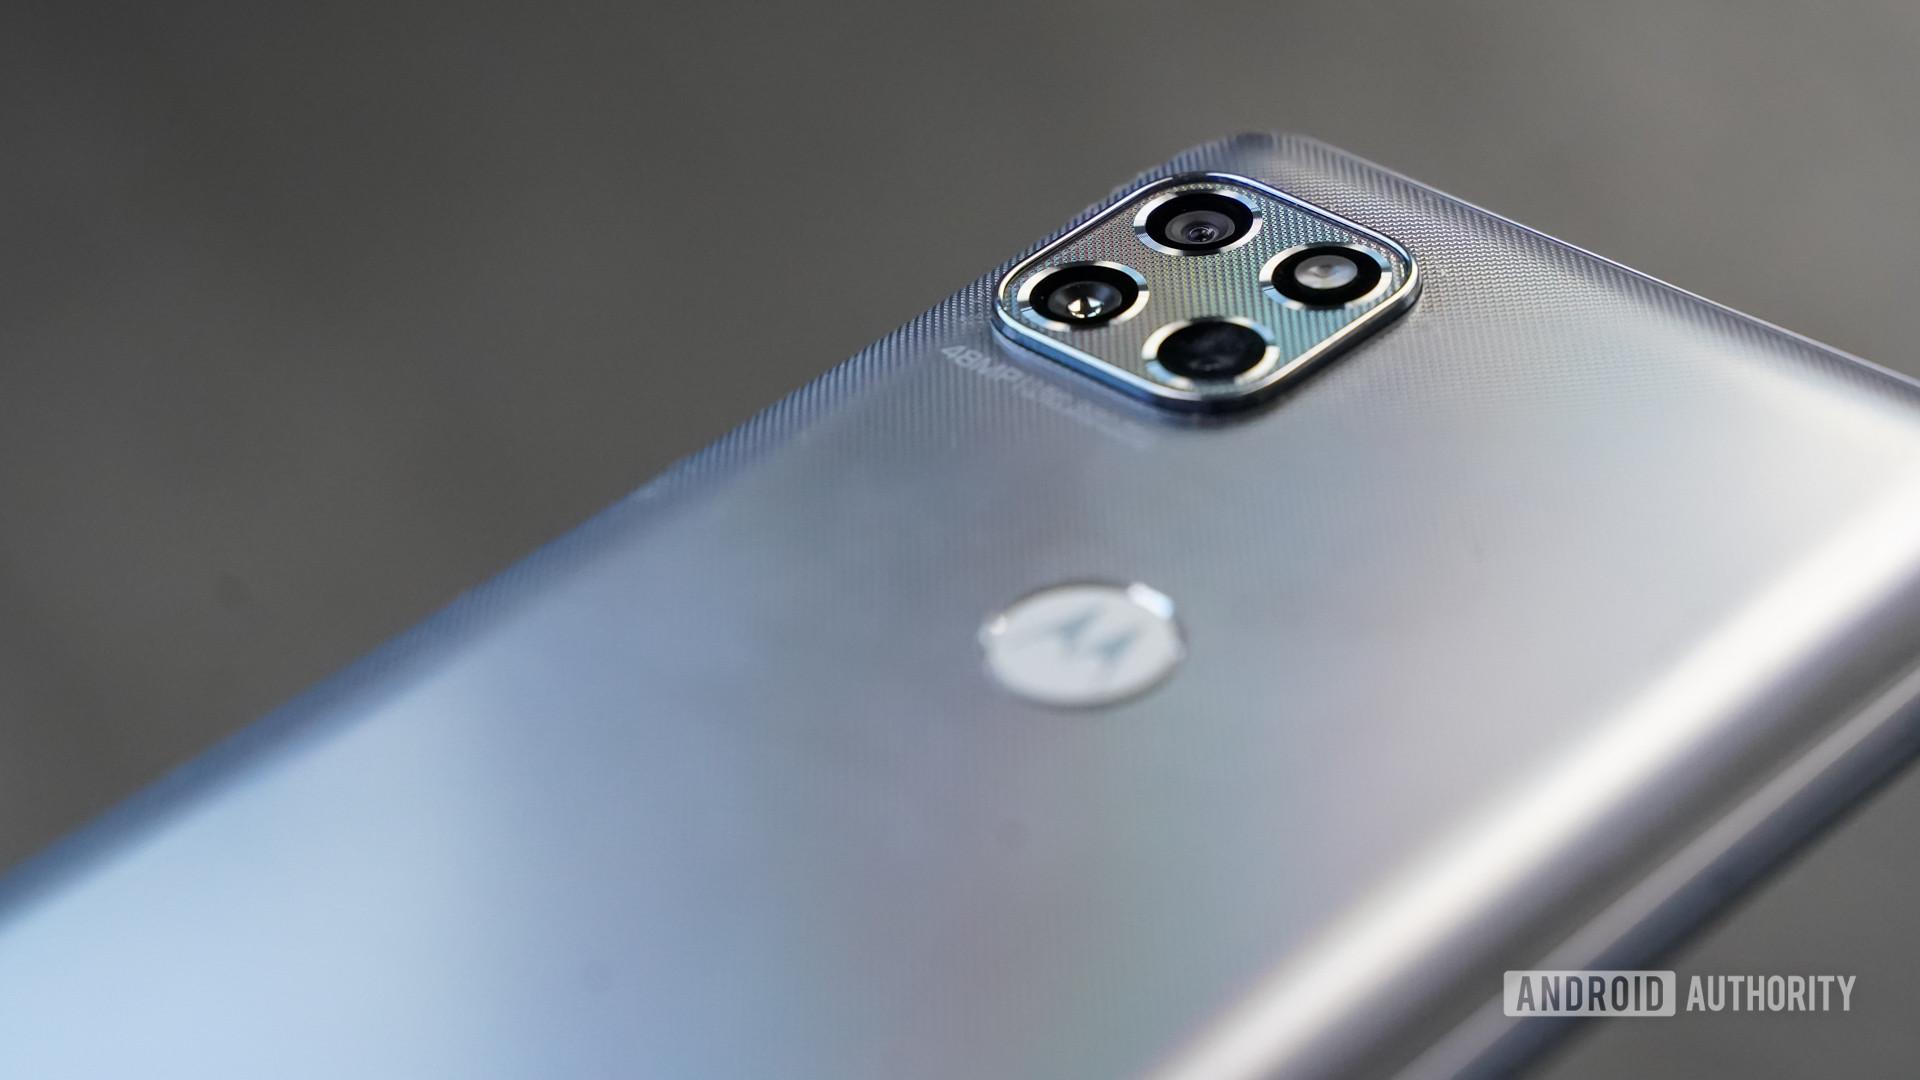 Motorola One 5G Ace camera moduile